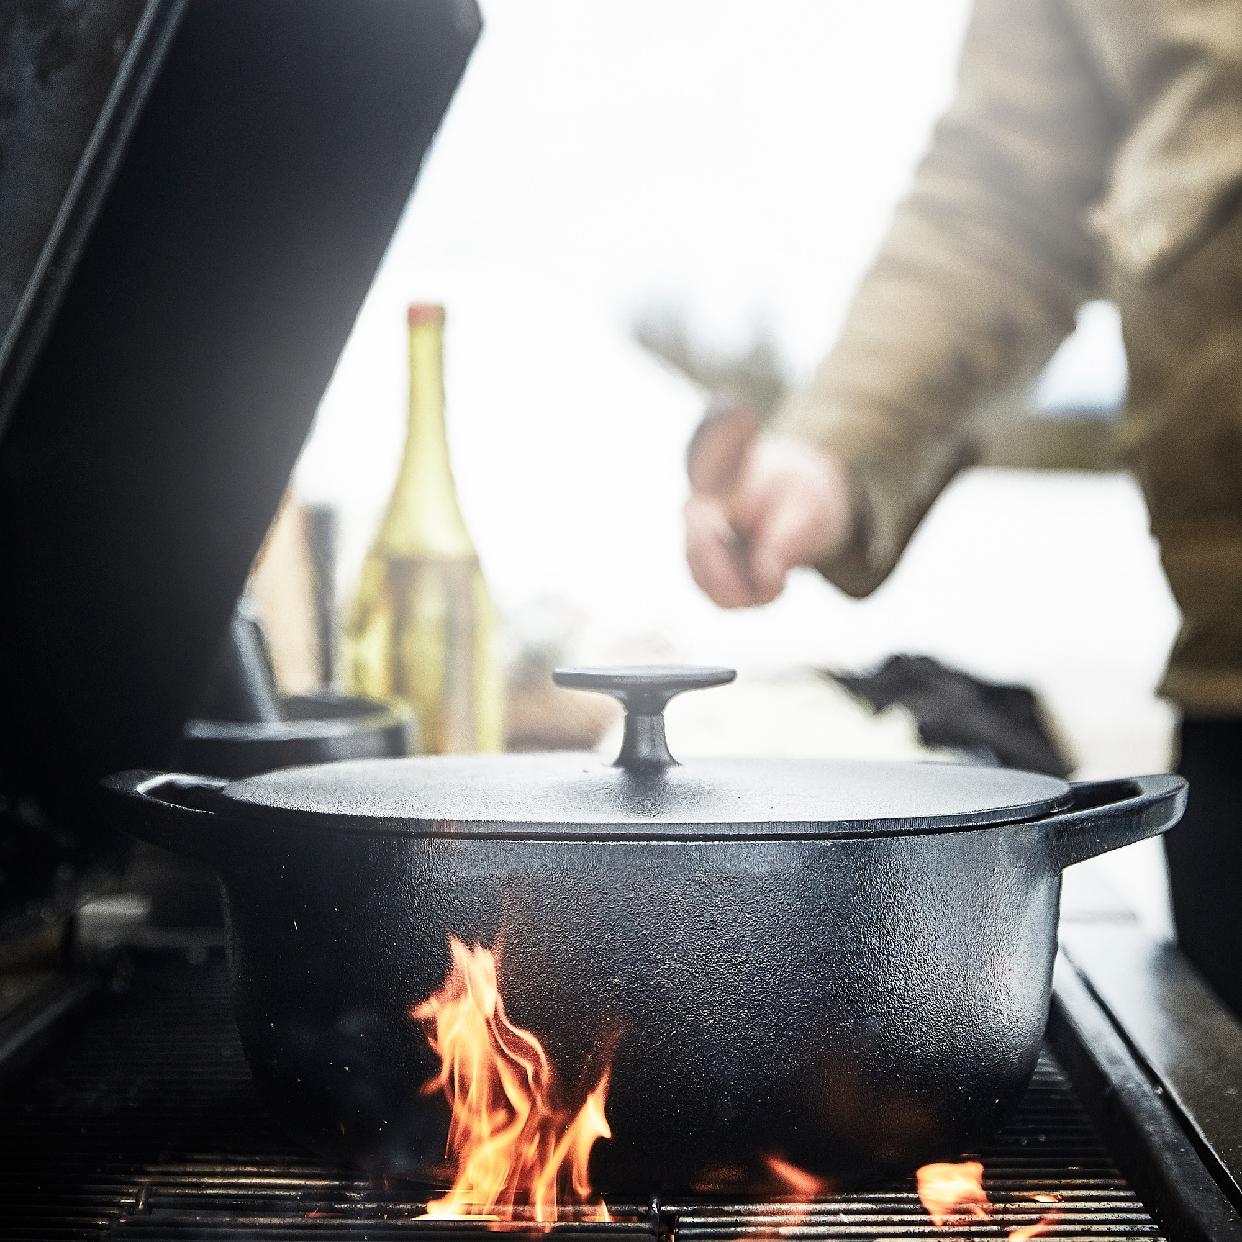 IKEA(イケア) ヴァルダーゲン キャセロール鍋の商品画像10